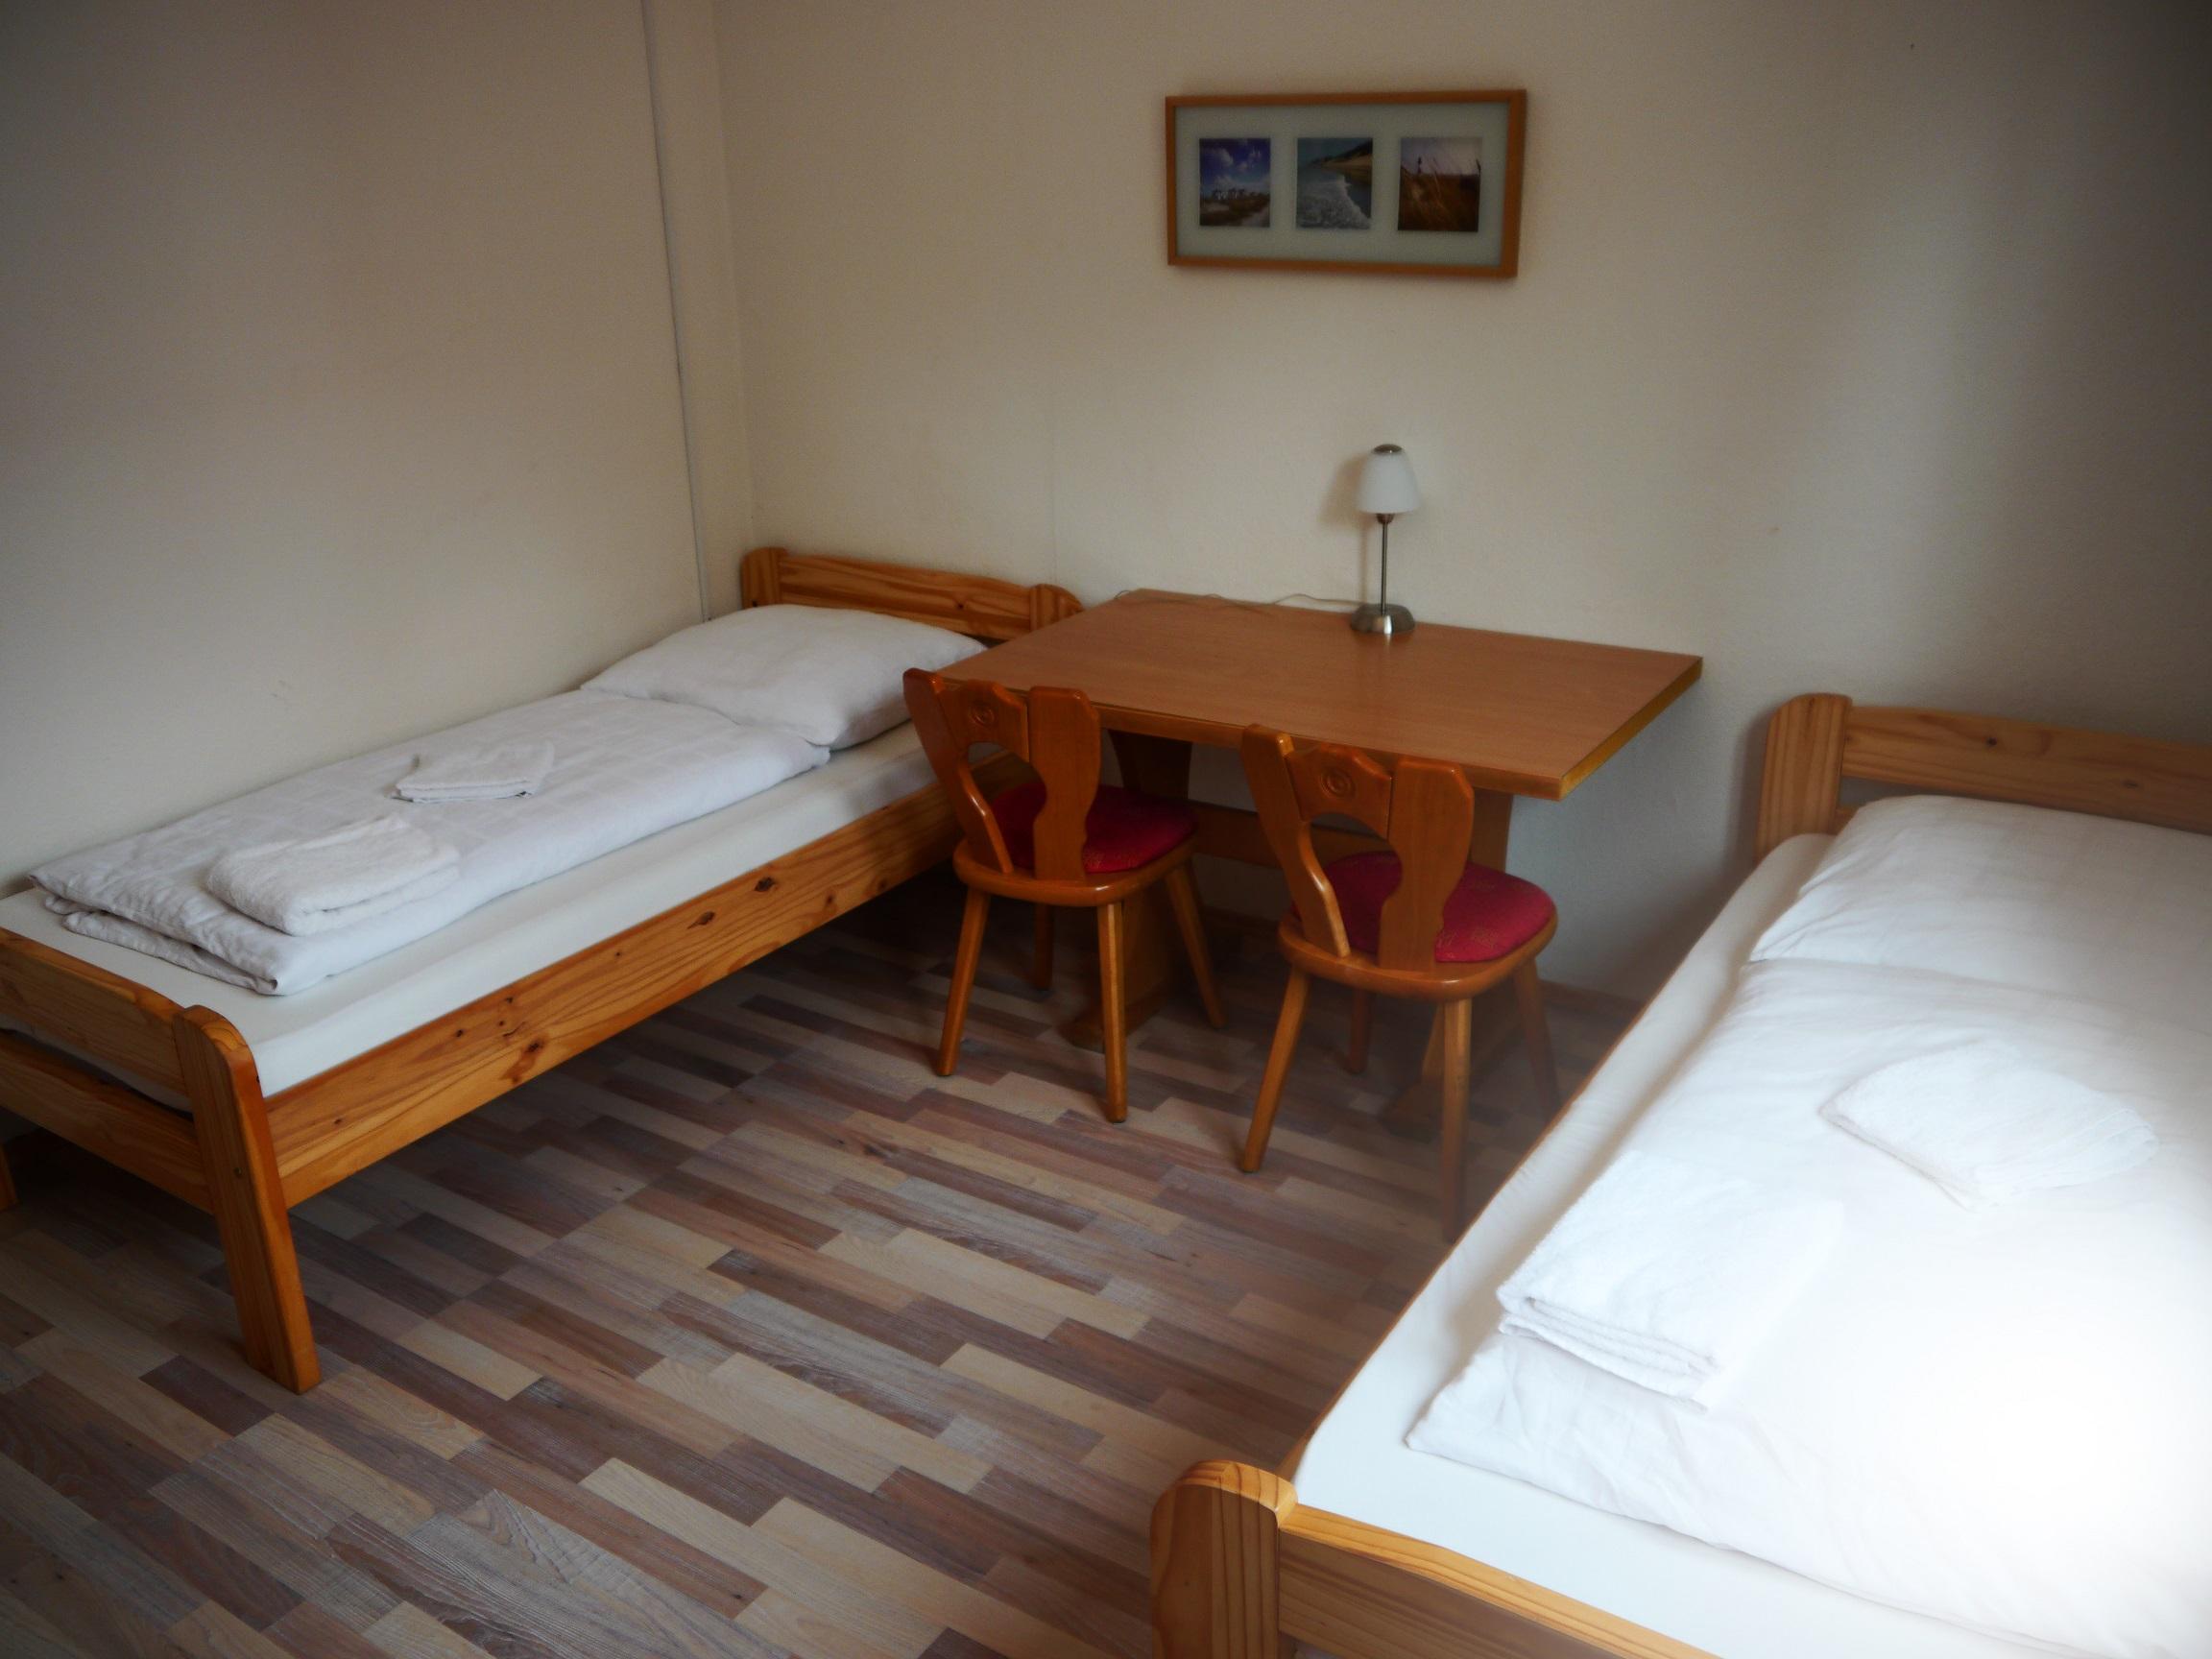 pension 21 70563 stuttgart vaihingen montagetreff. Black Bedroom Furniture Sets. Home Design Ideas